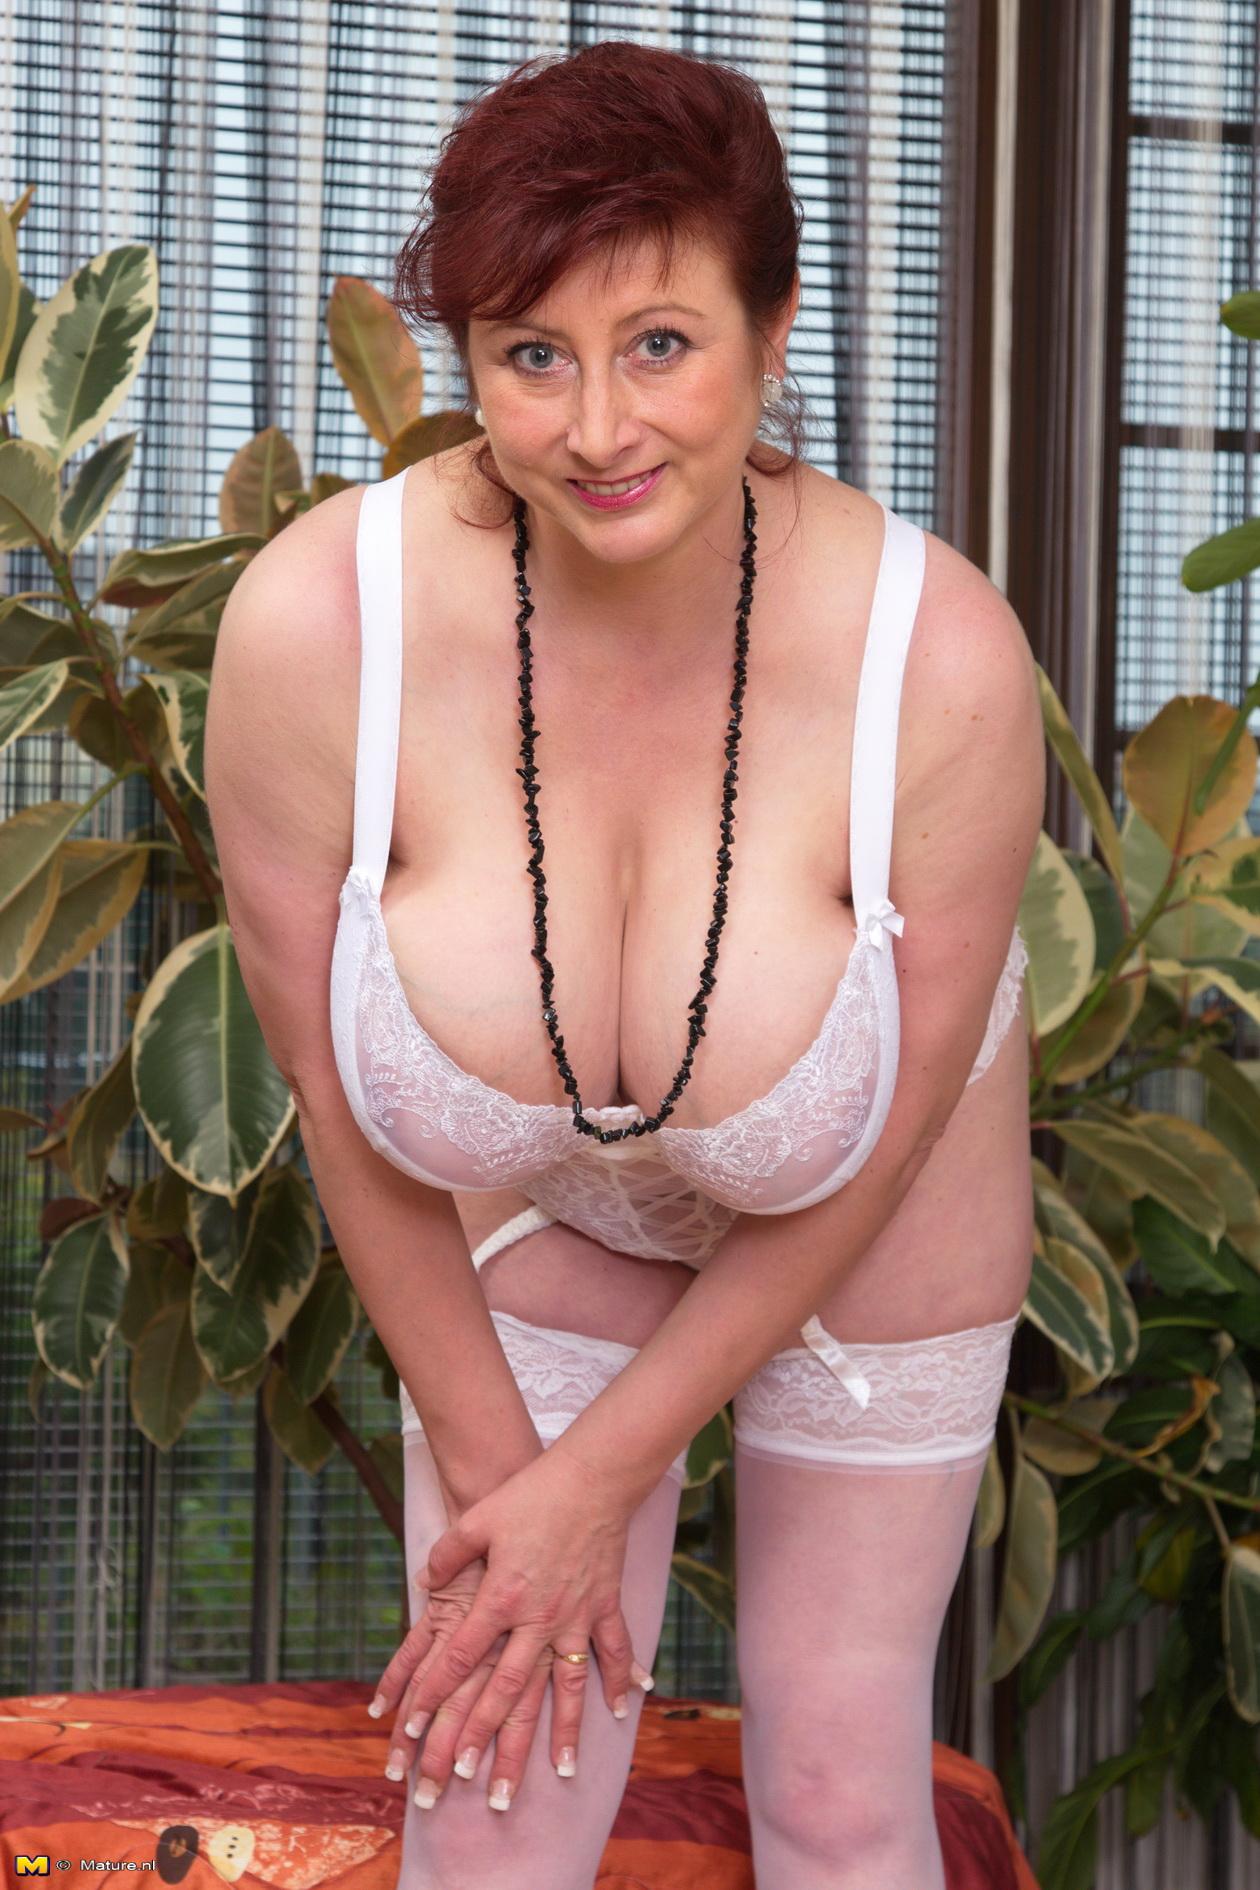 Big butt latin grandma 105 5